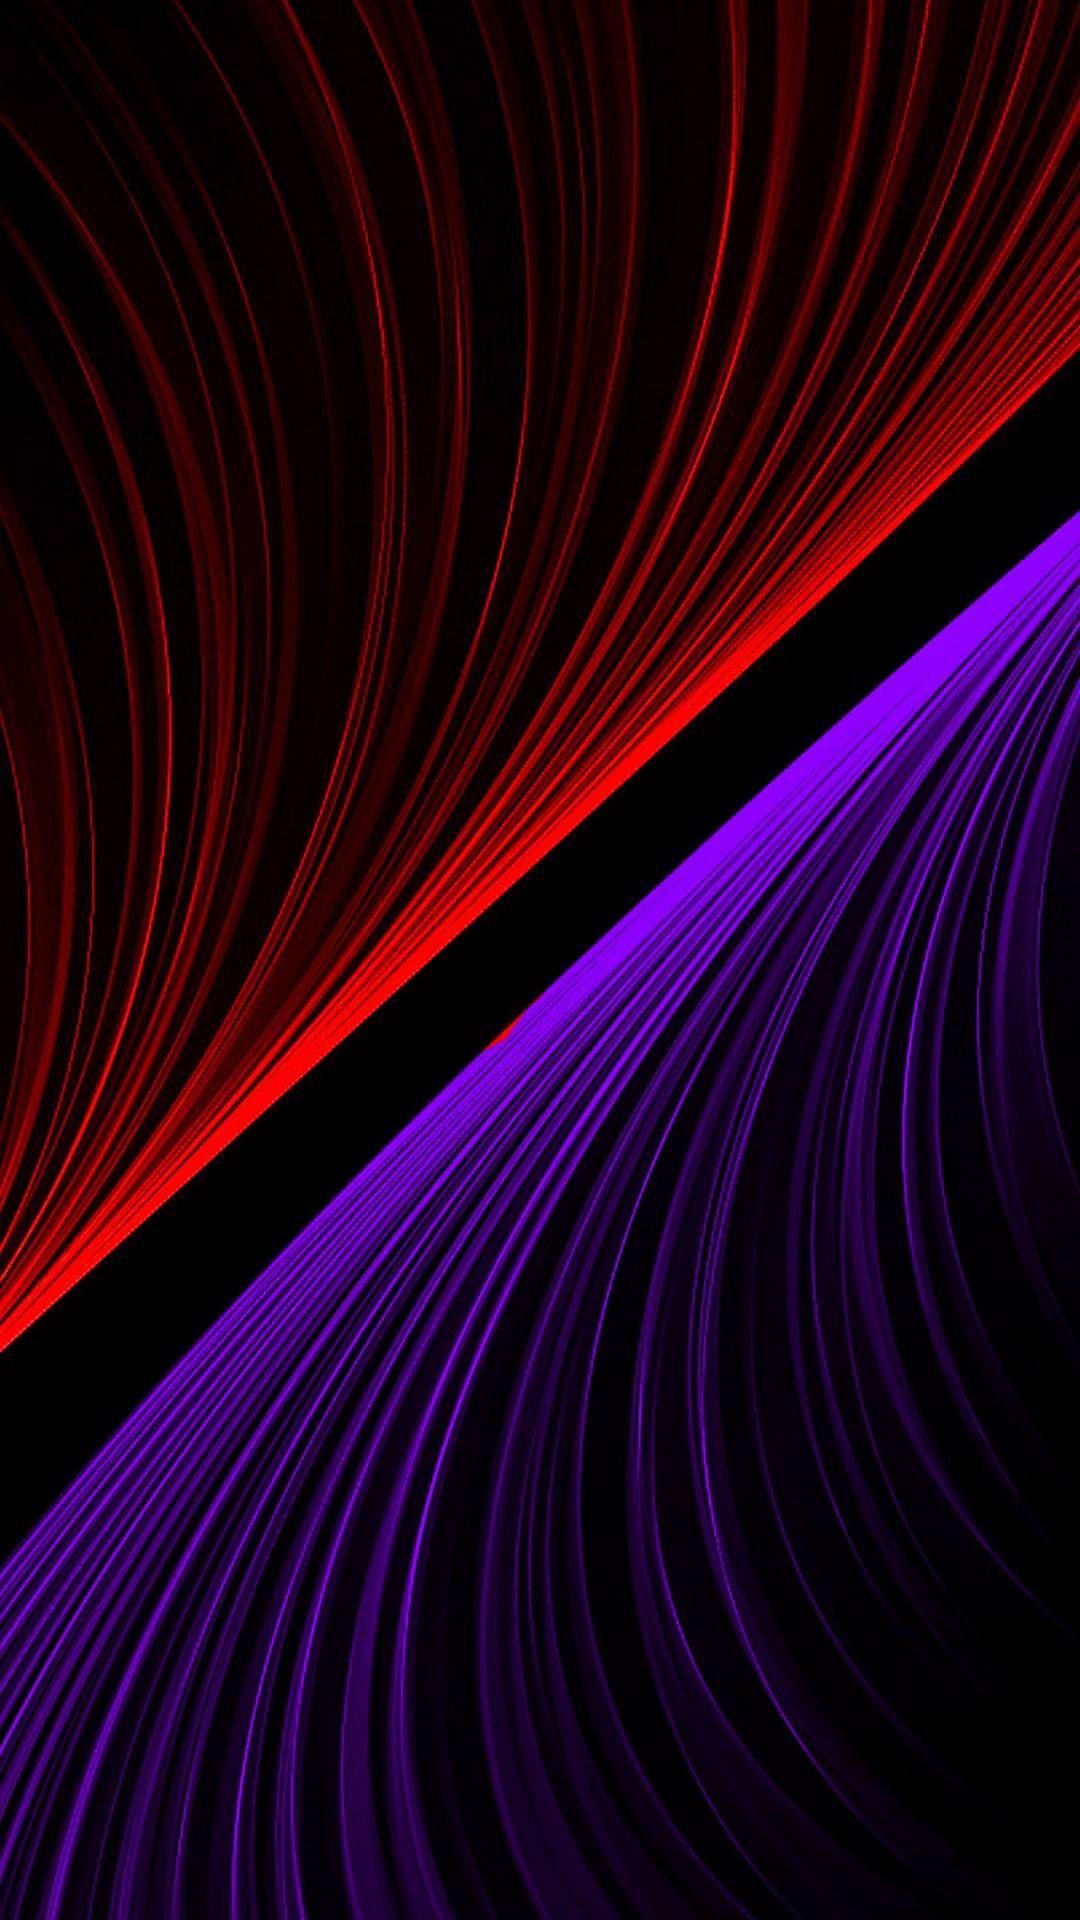 Neon Wallpaper Neon wallpaper, Iphone wallpaper violet